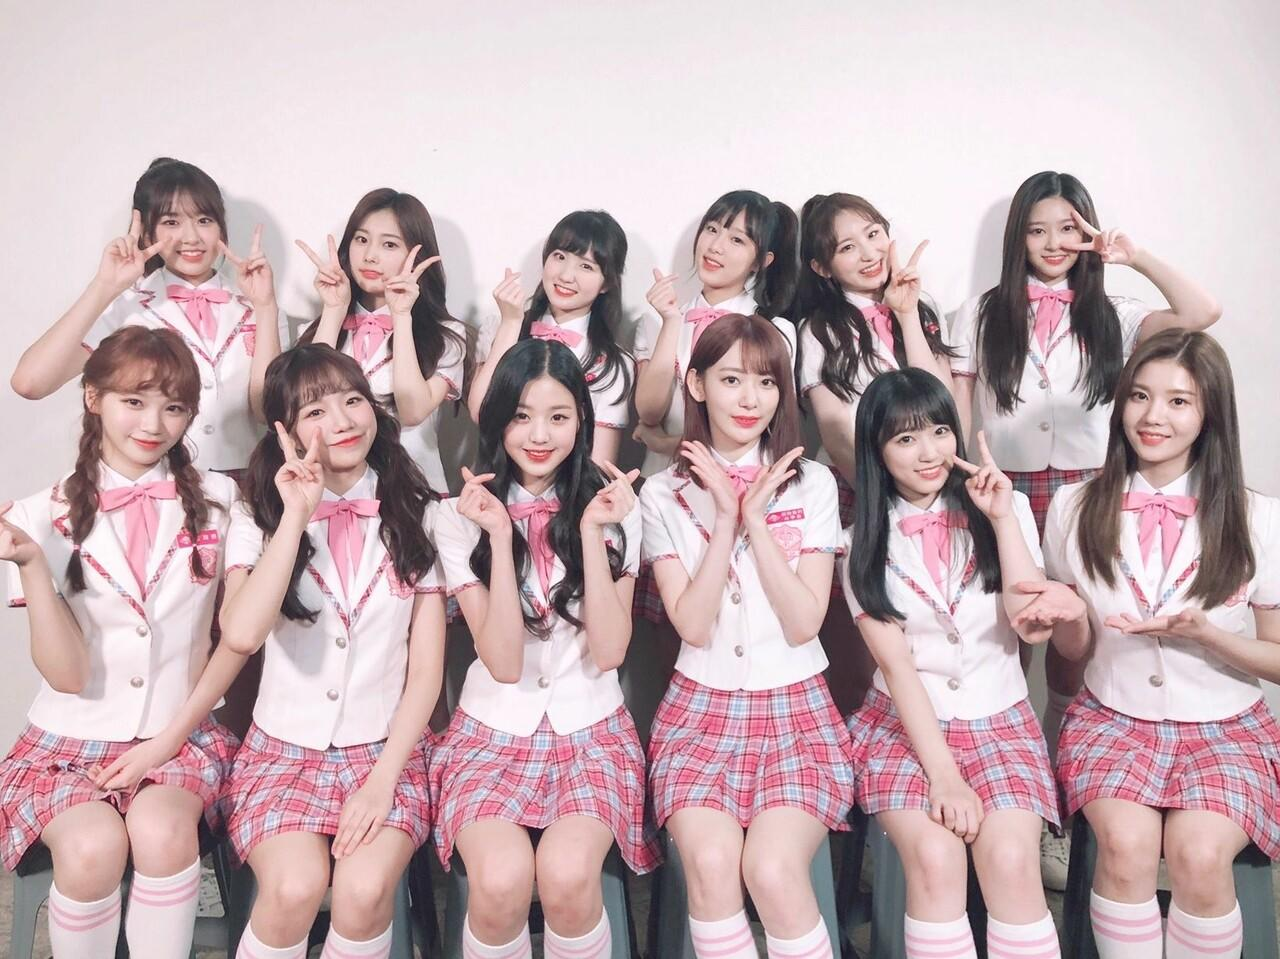 Mnet Rilis Pernyataan Resmi Terkait IZ*ONE